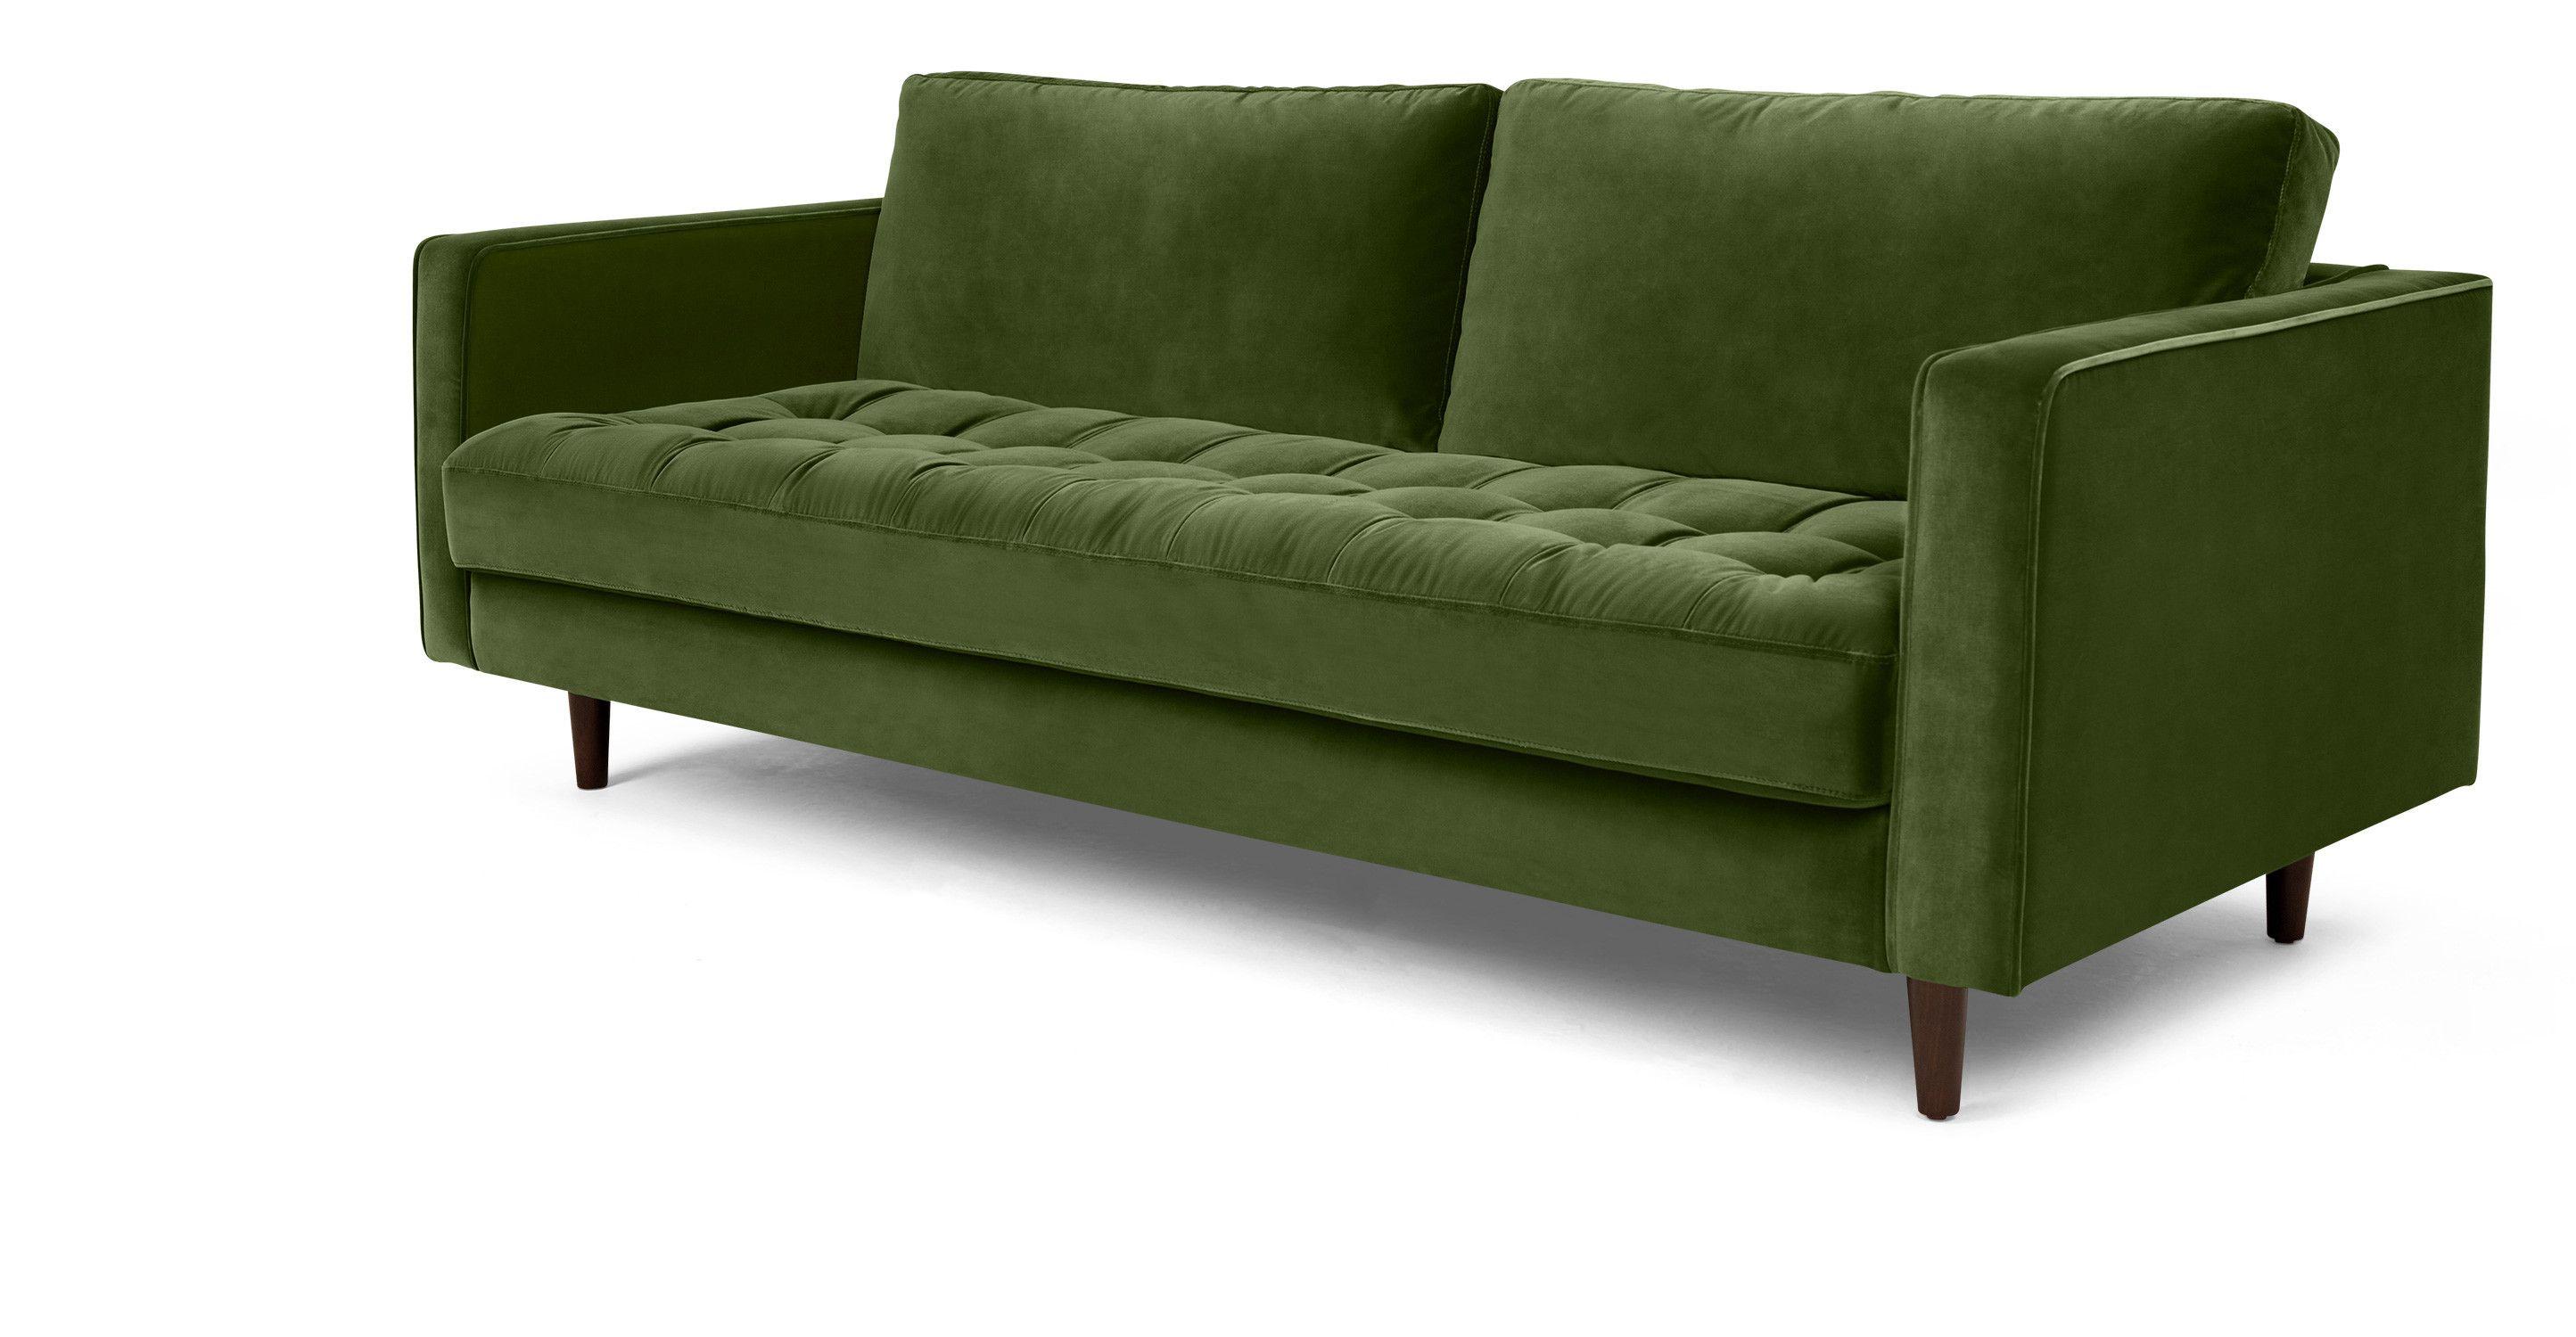 Scott 3 Sitzer Sofa Samt in Grasgrün